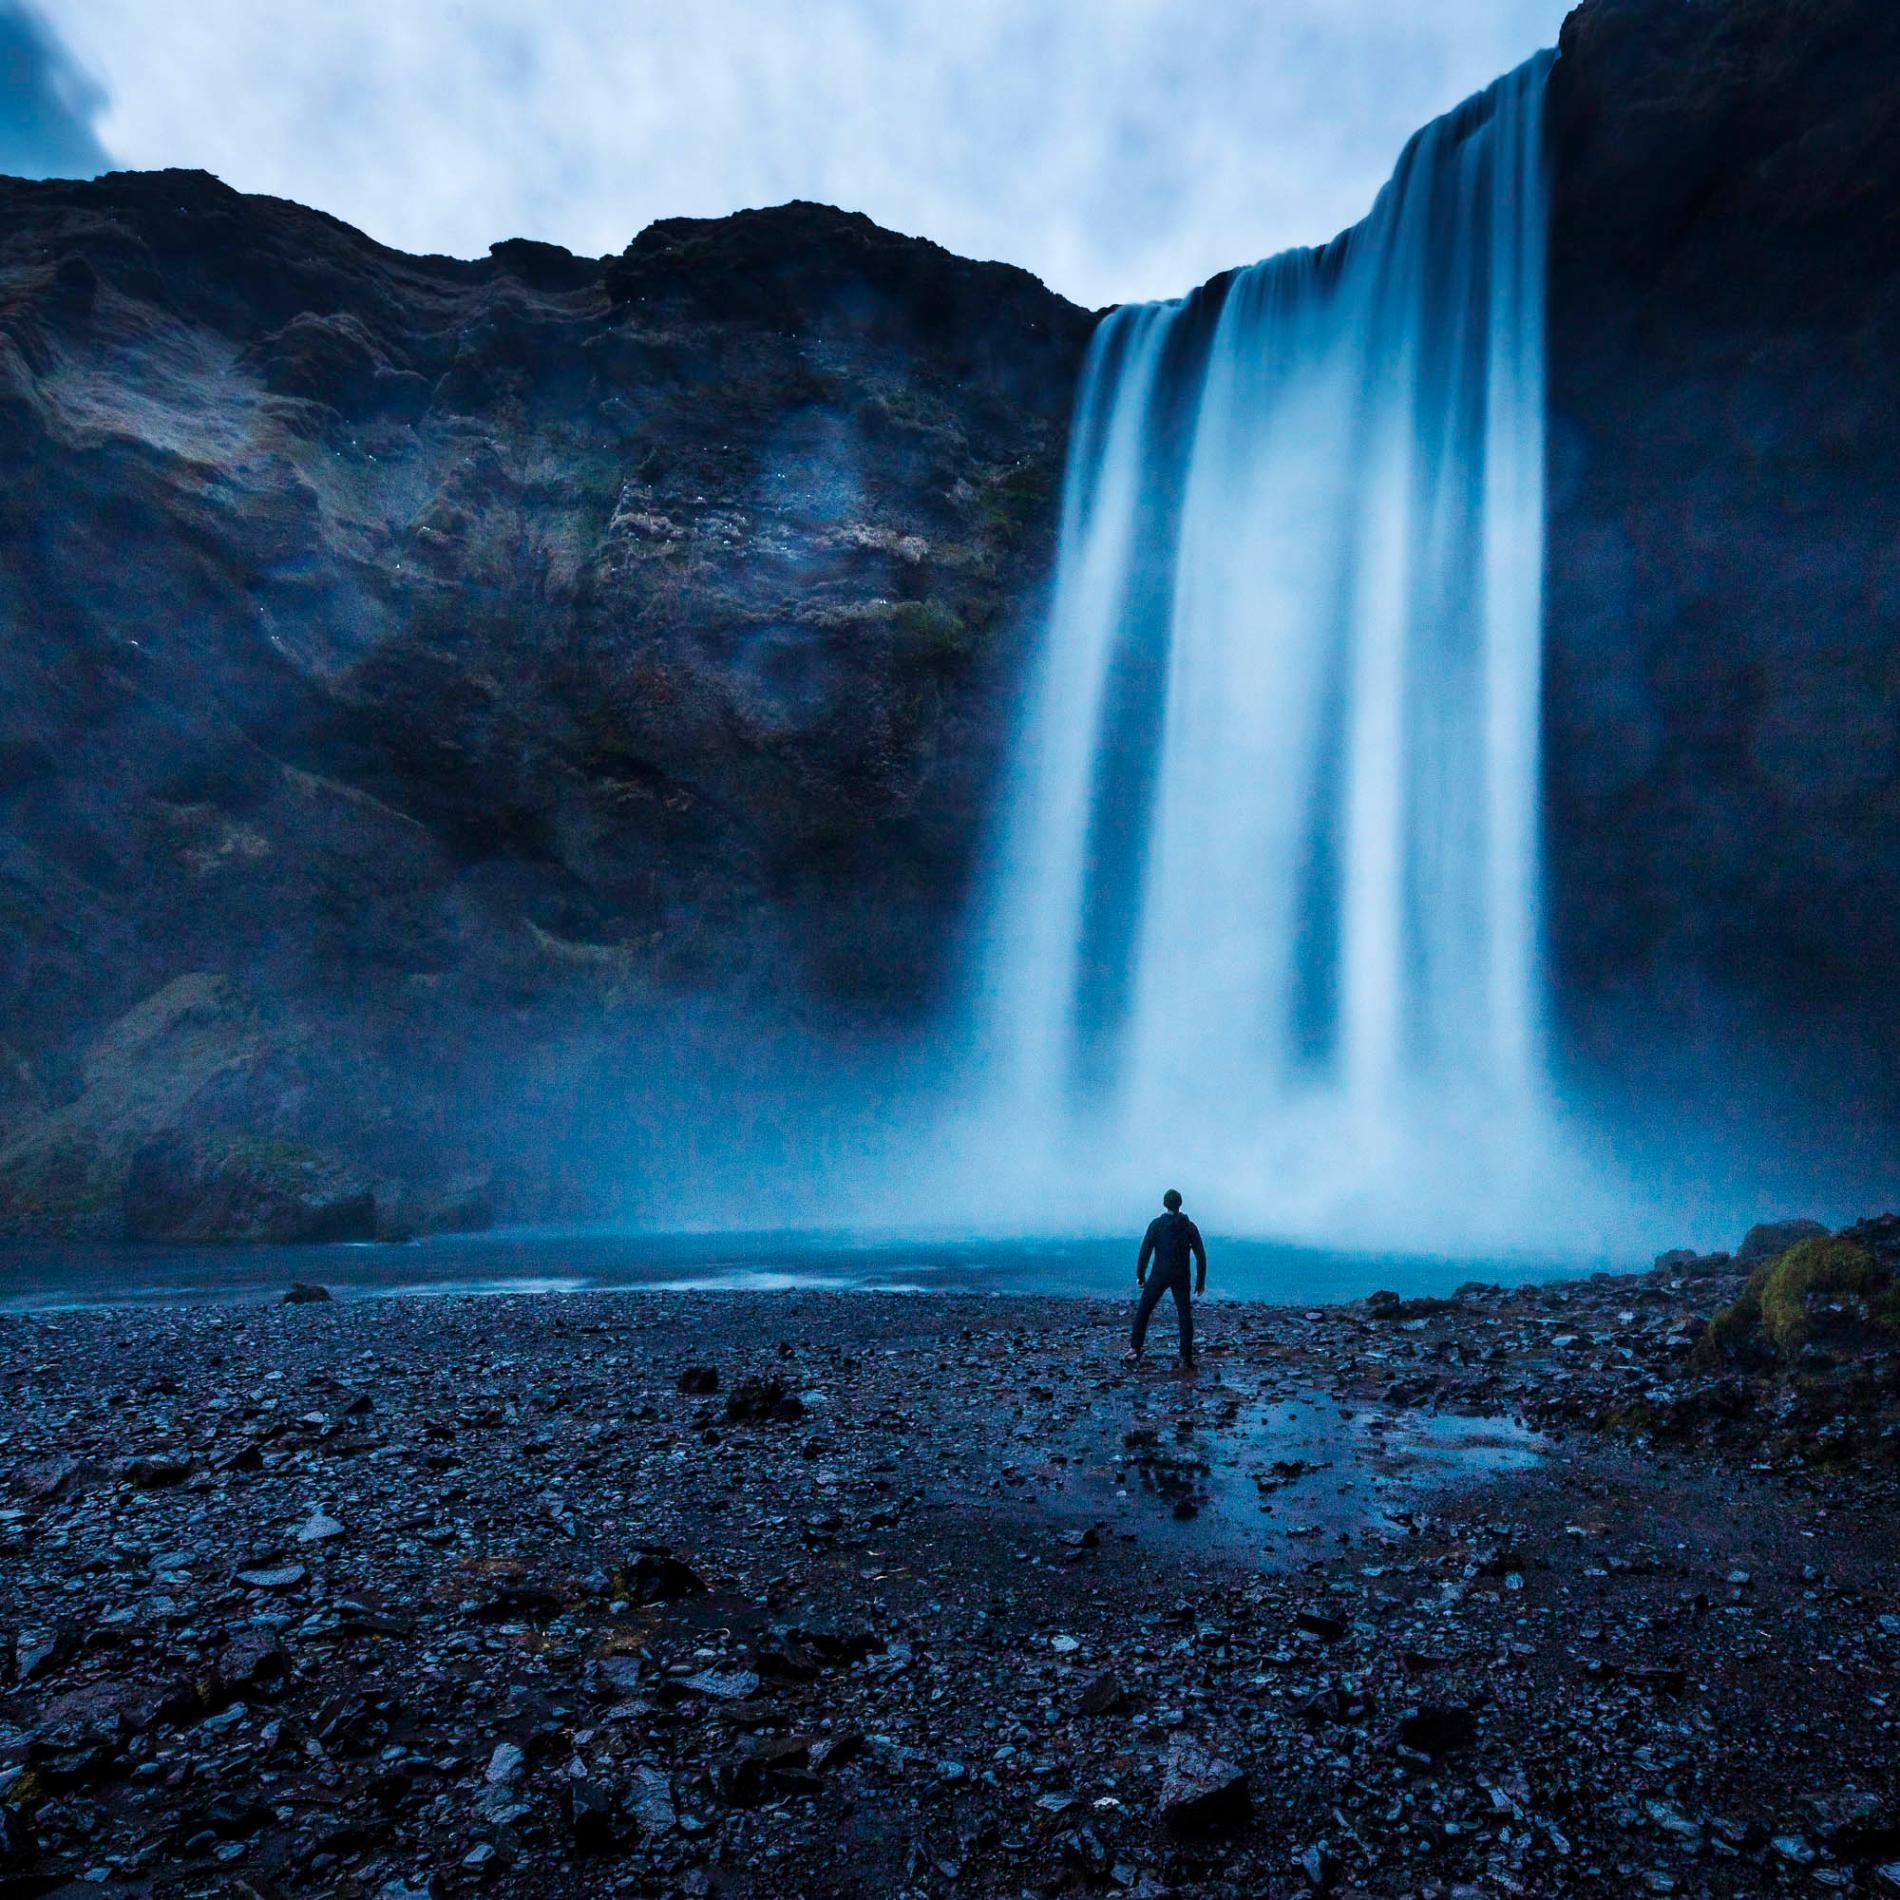 Photograph by Stephen Alvarez, National Geographic